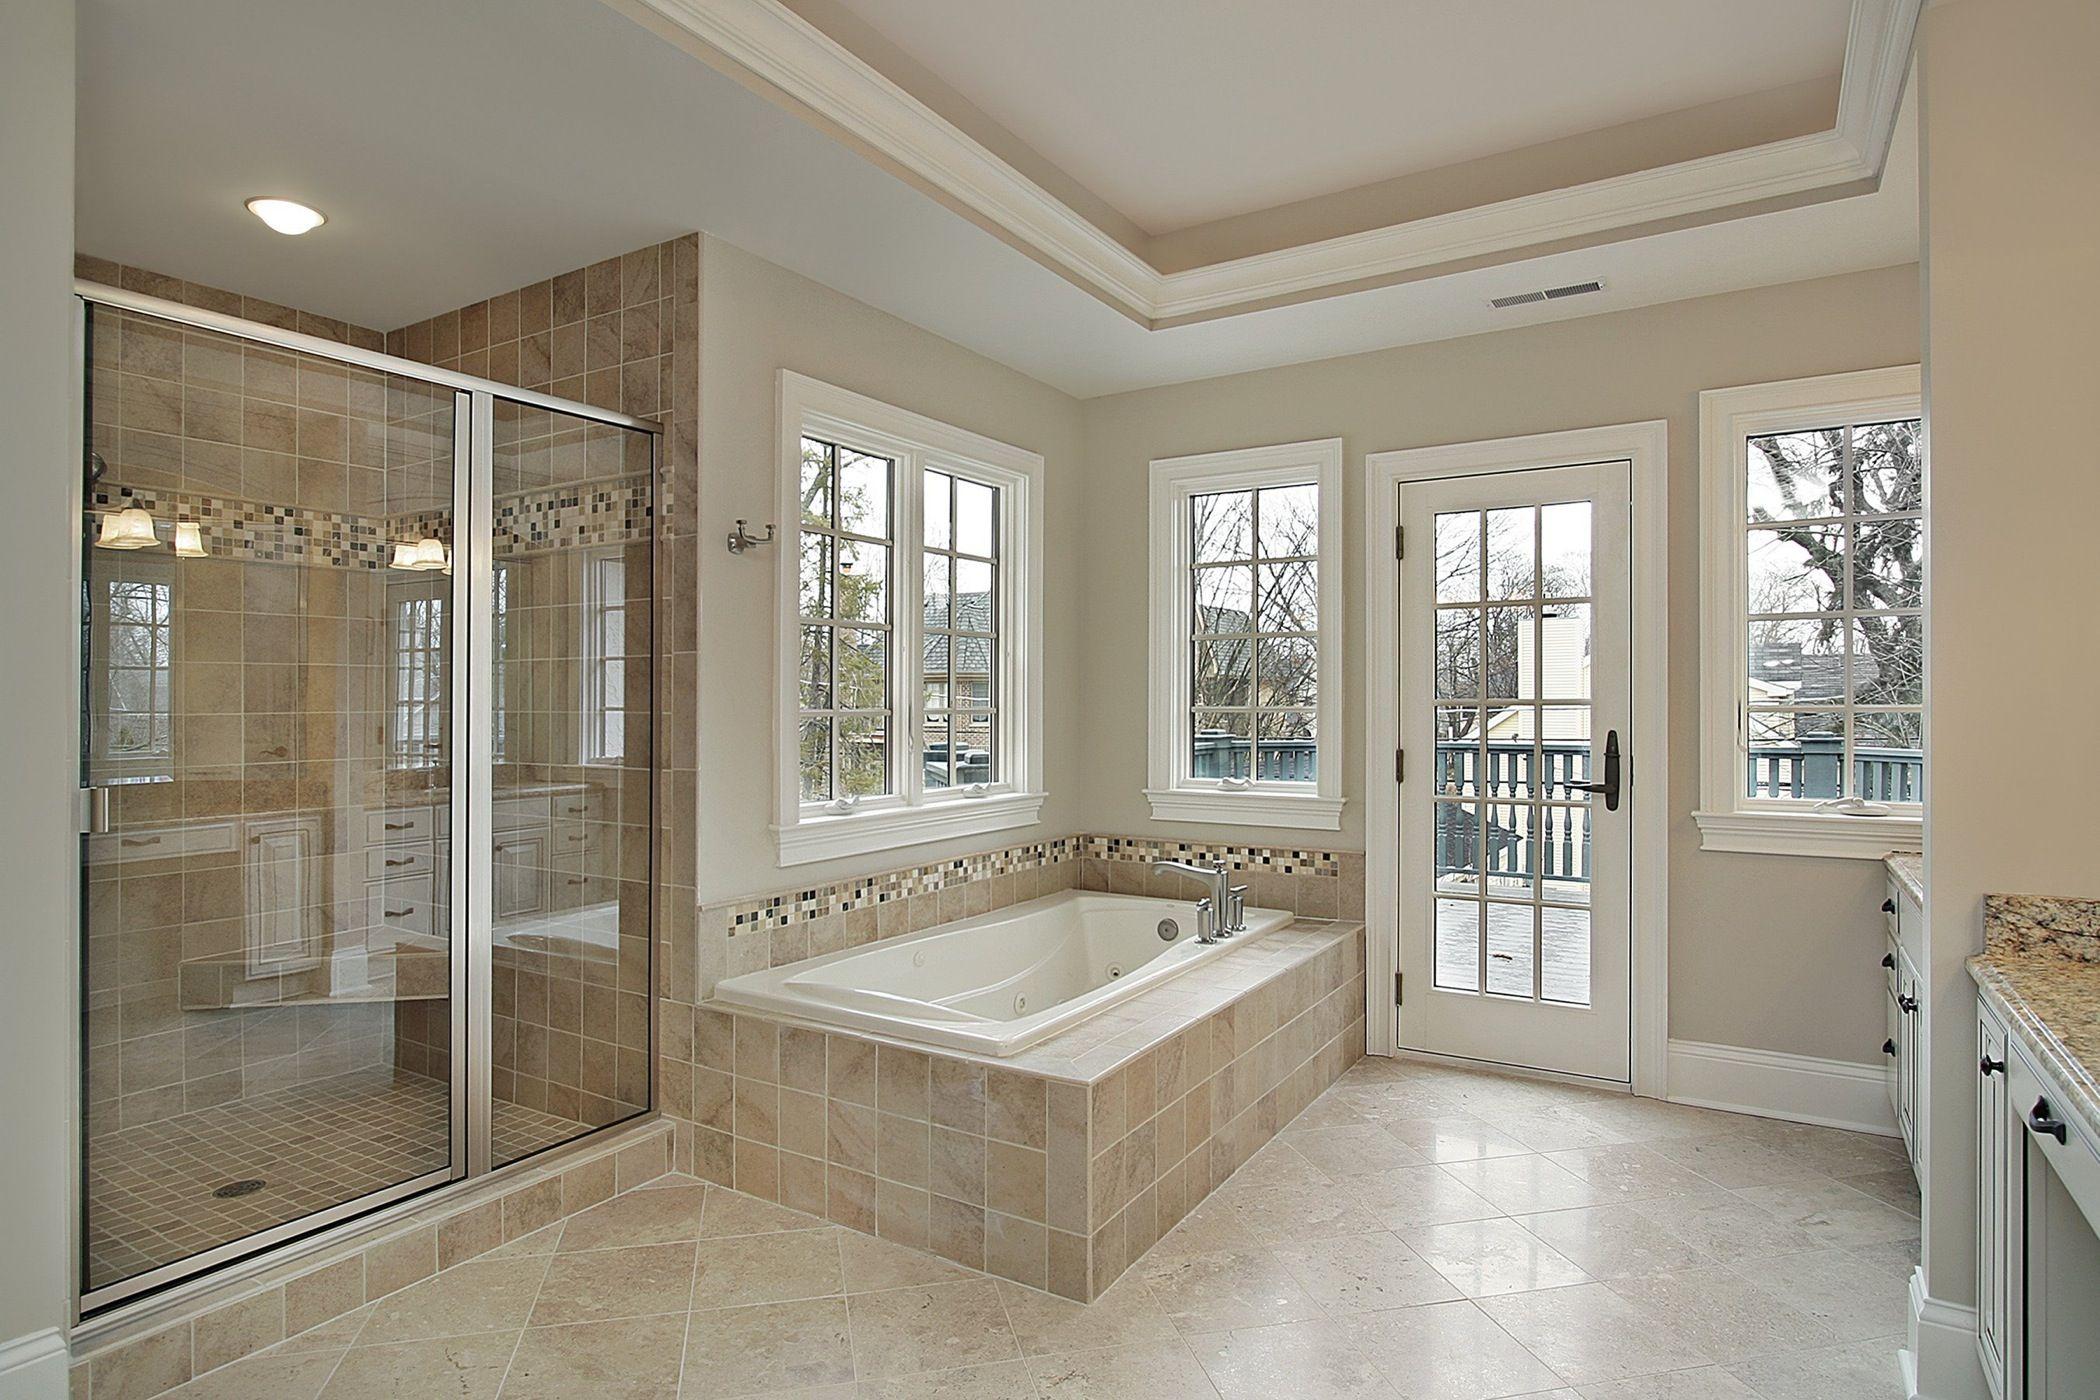 idaho custom remodeling bathroom remodel ogle boise renaissance